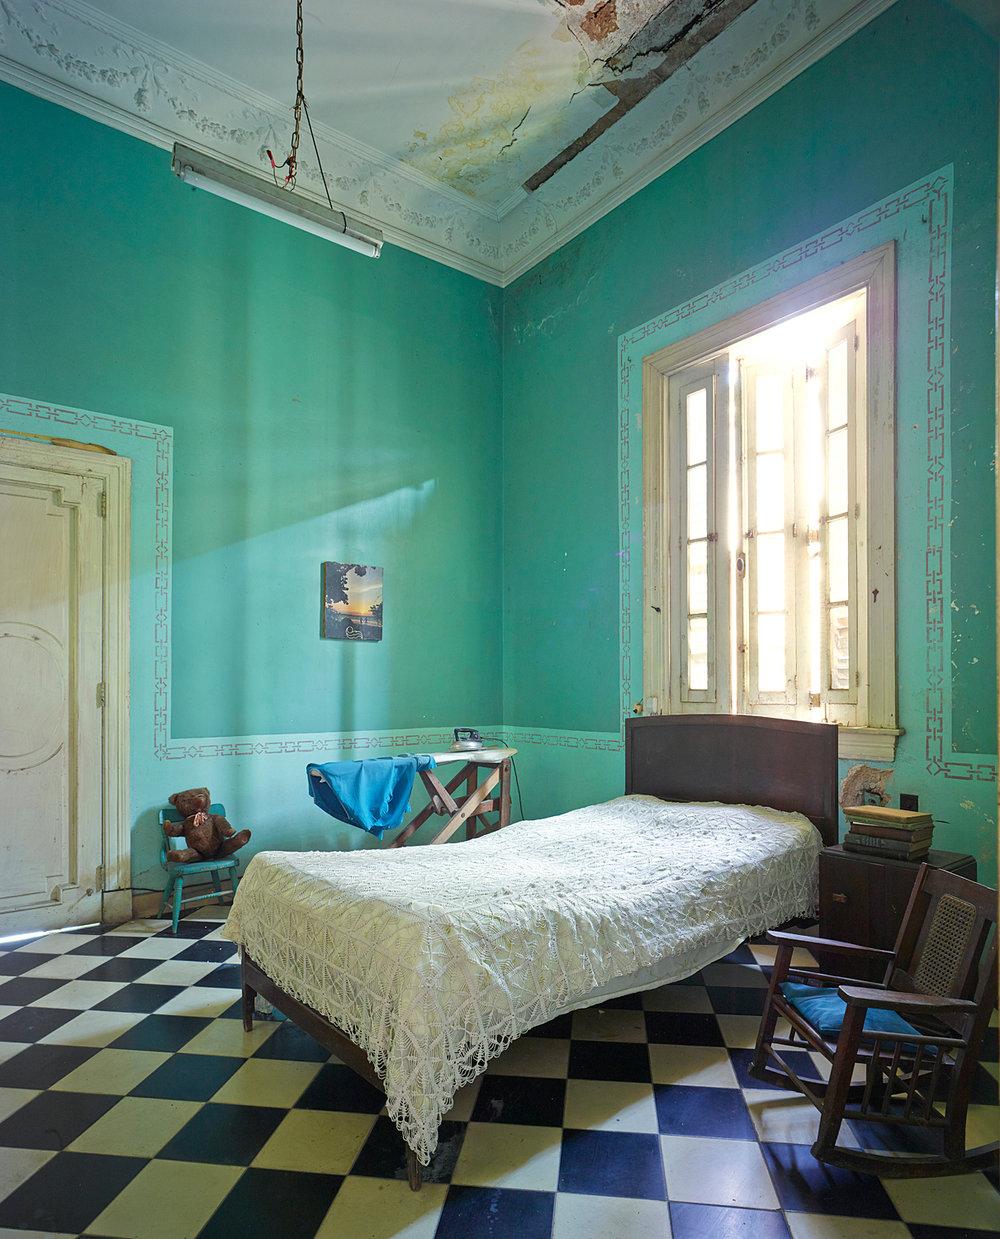 Childrens Room, Havanna, Cuba, 2014